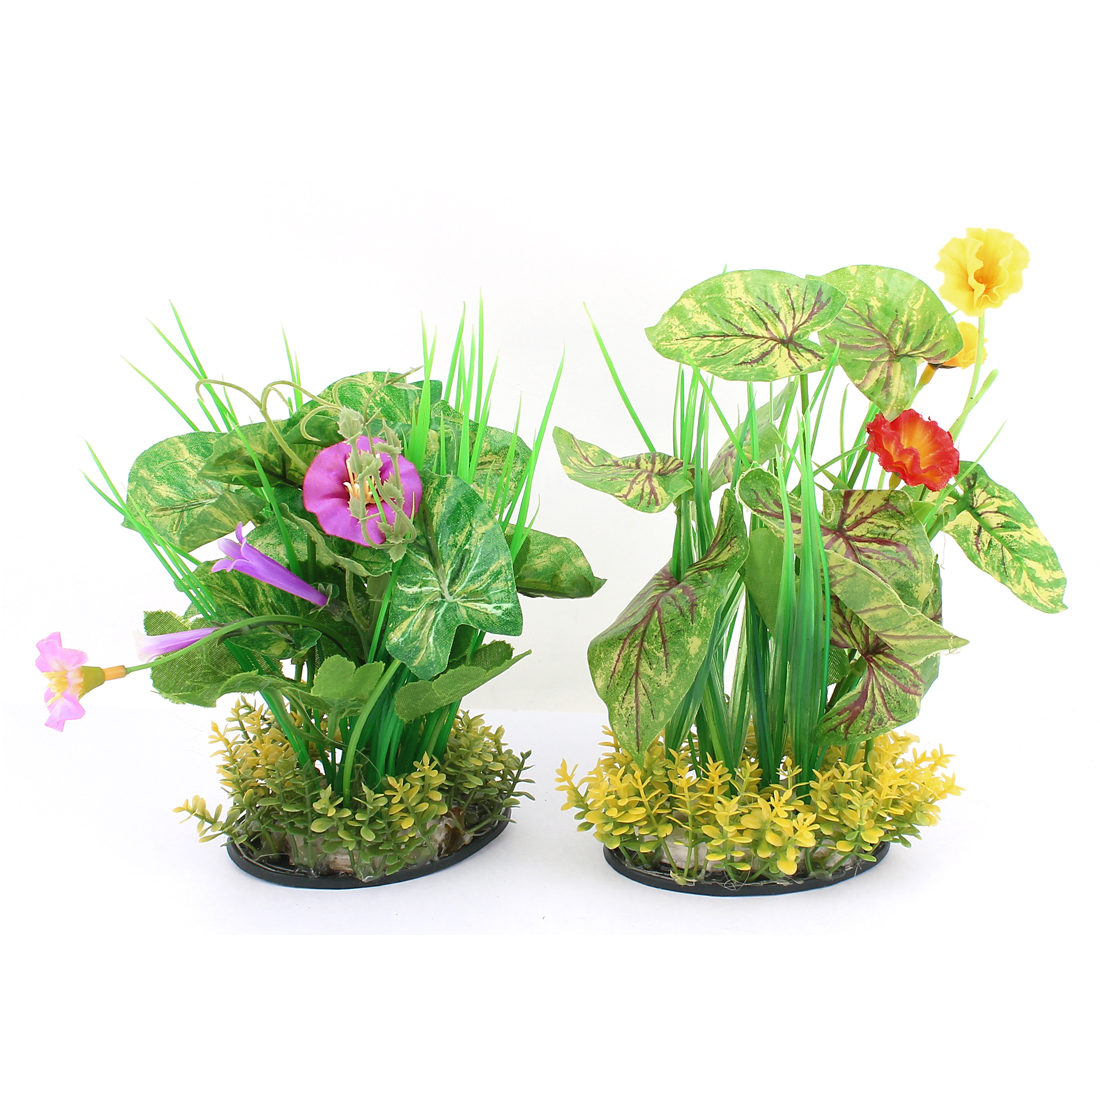 2pcs Fish Tank Flower Plants Decor Aquarium Ornament Green Yellow